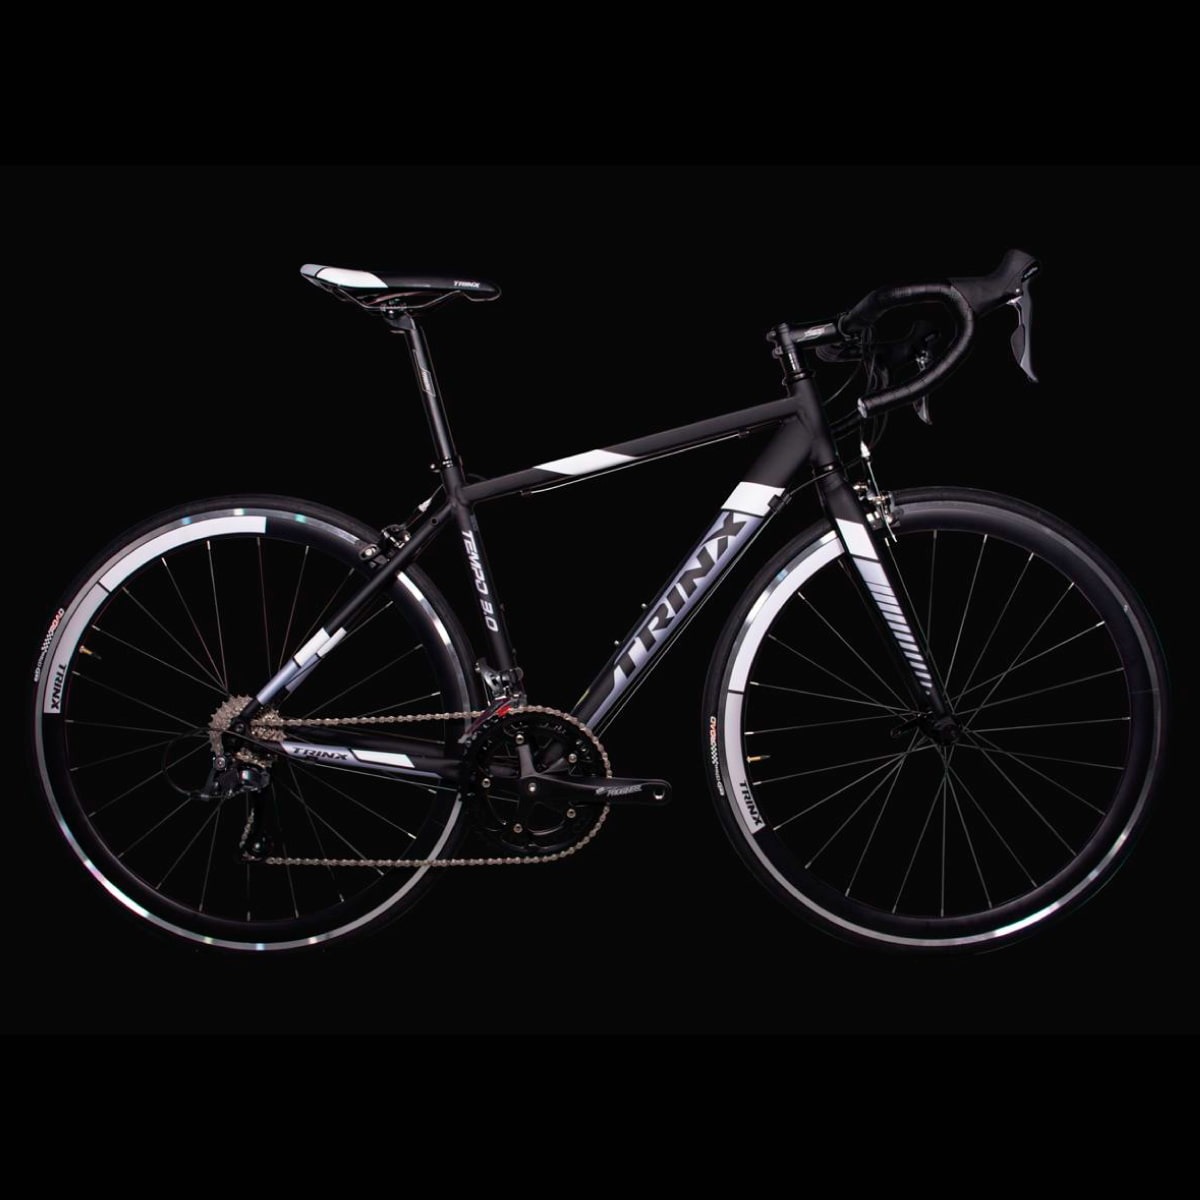 Bike Trinx Tempo 3.0 2020 16v Shimano Preto Branco